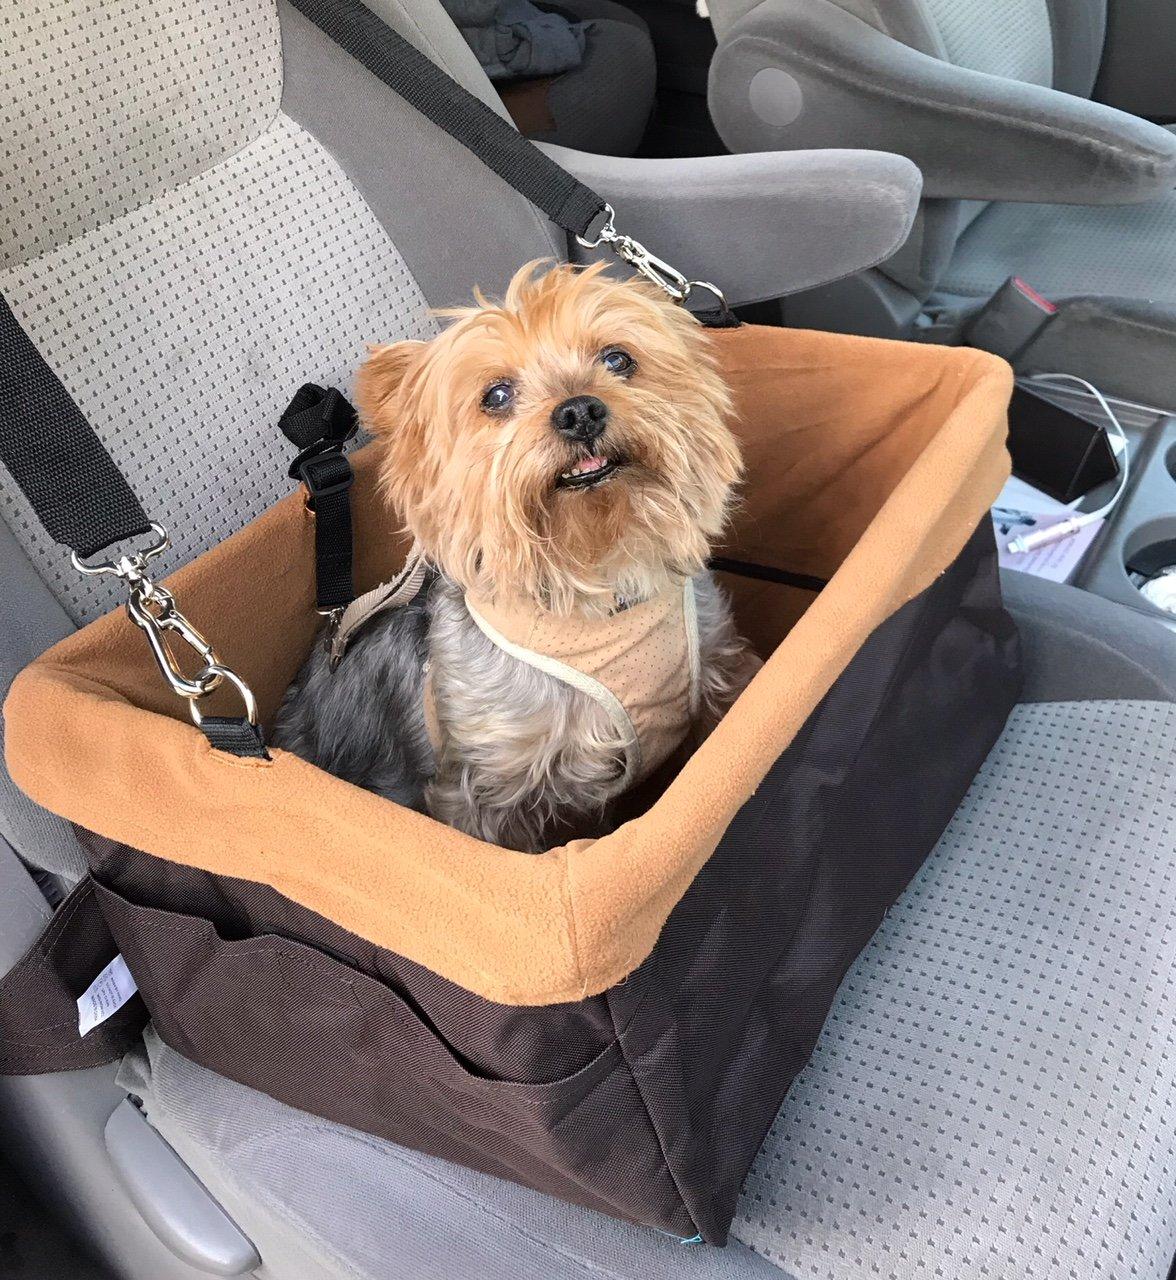 Anima cs1701 Pet Boost Car Seat, Brown, 16 x 13 x 8.5